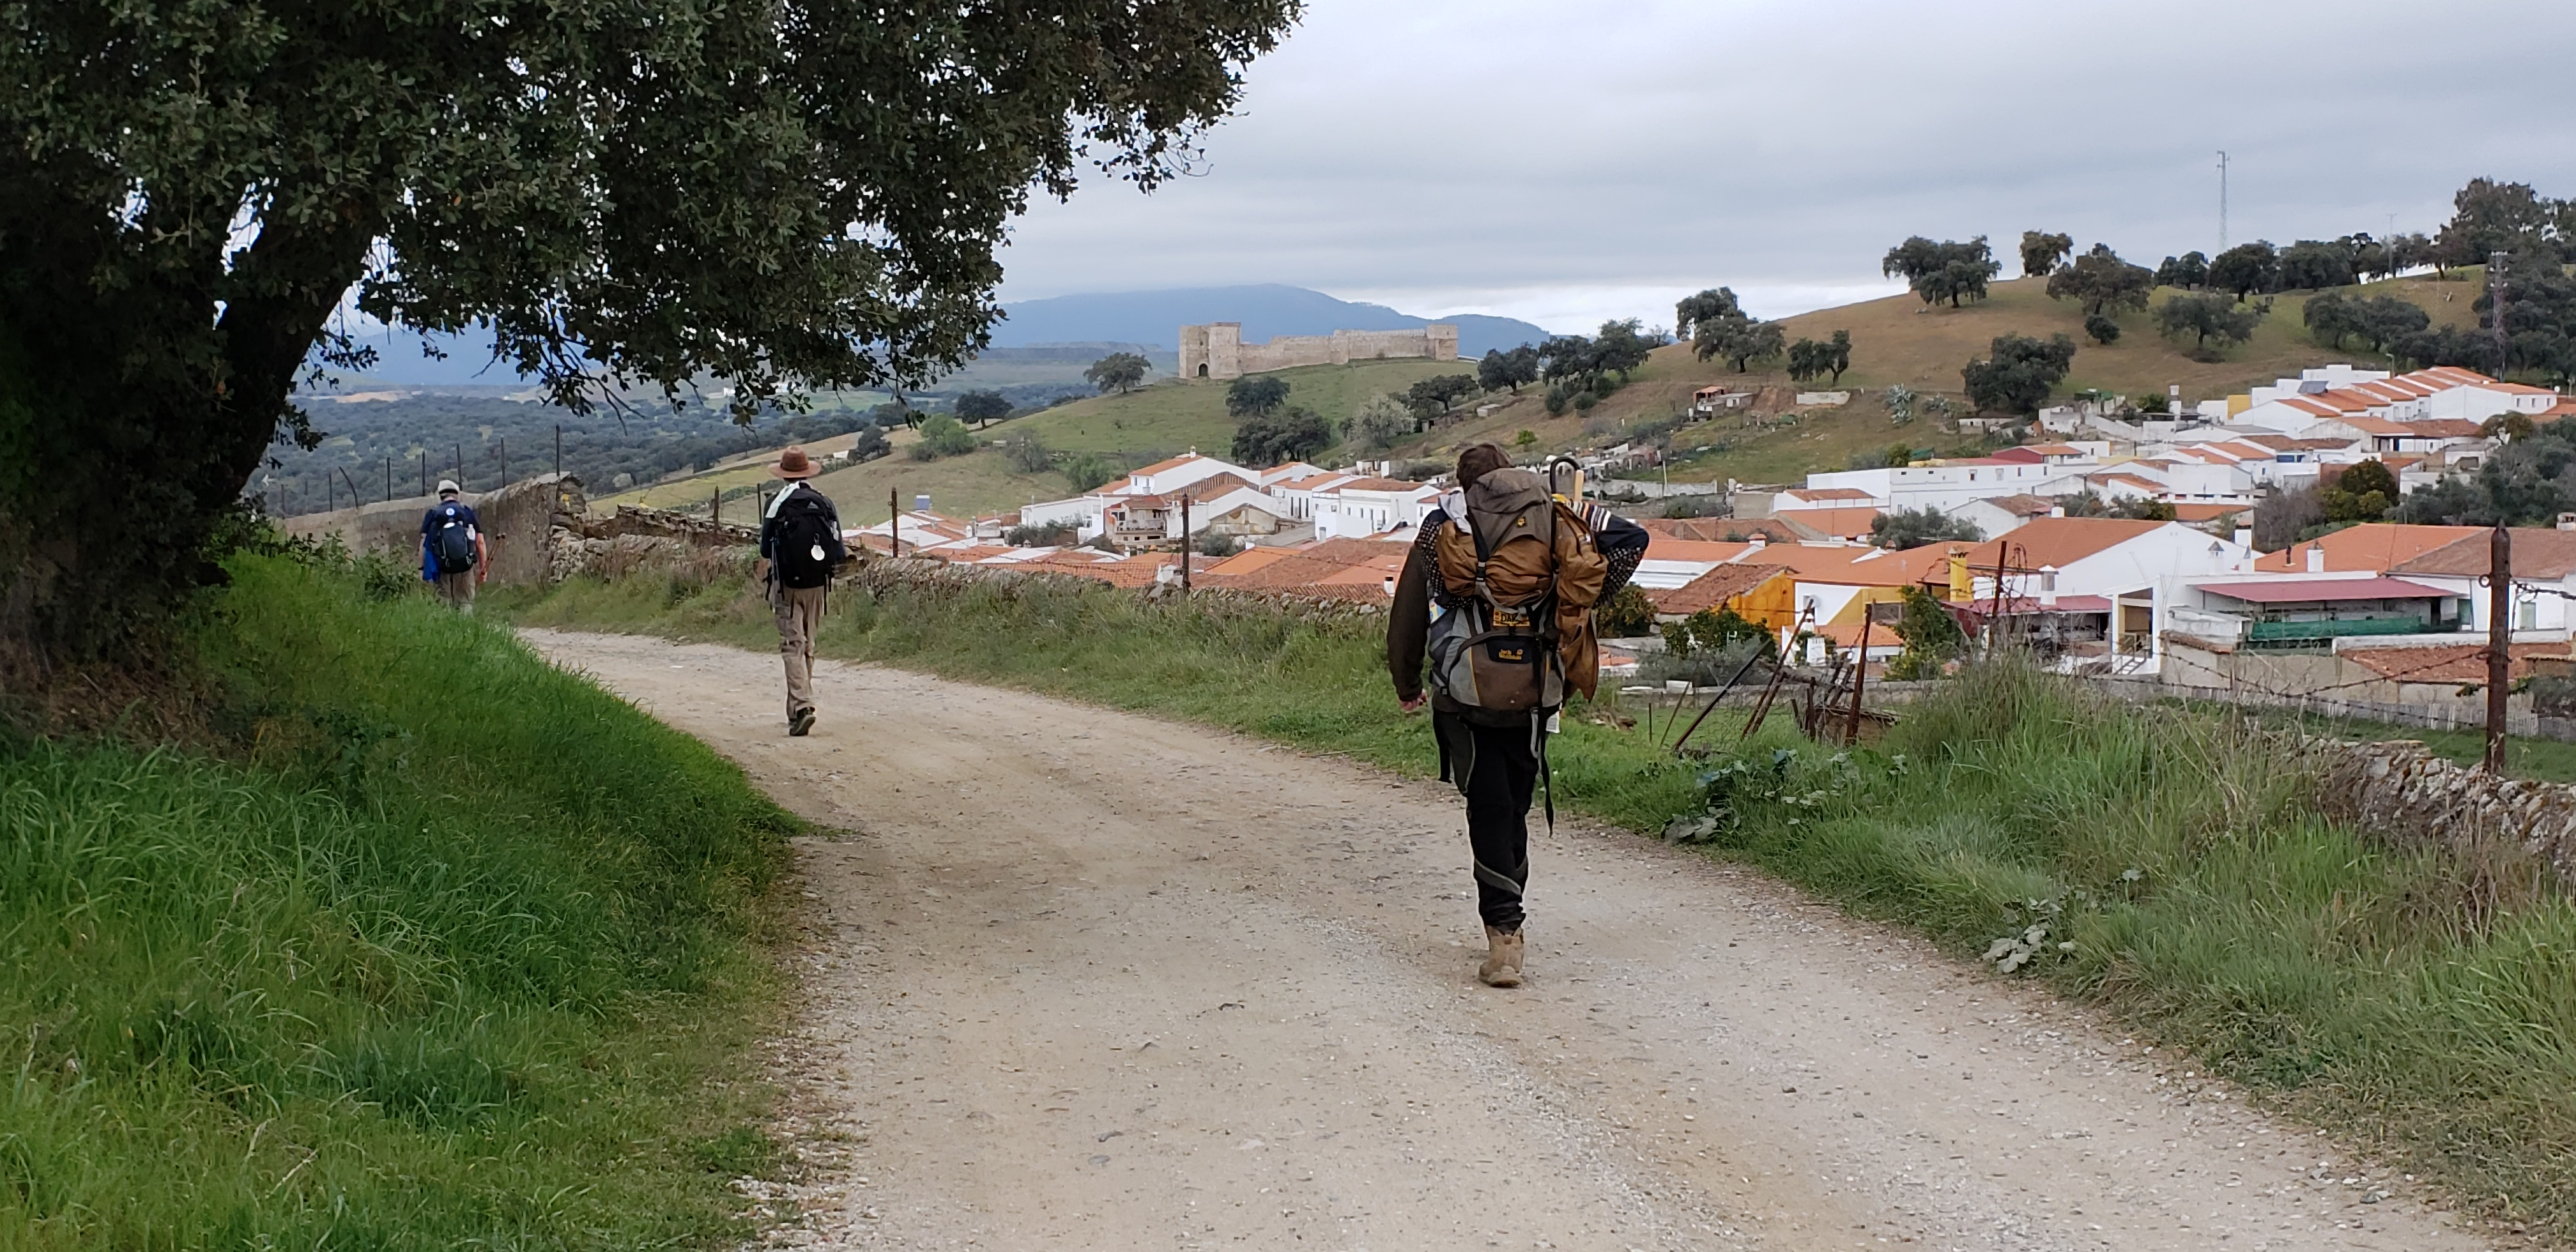 L2F Jul 20 pic Spain Way of St James pilgrim walking